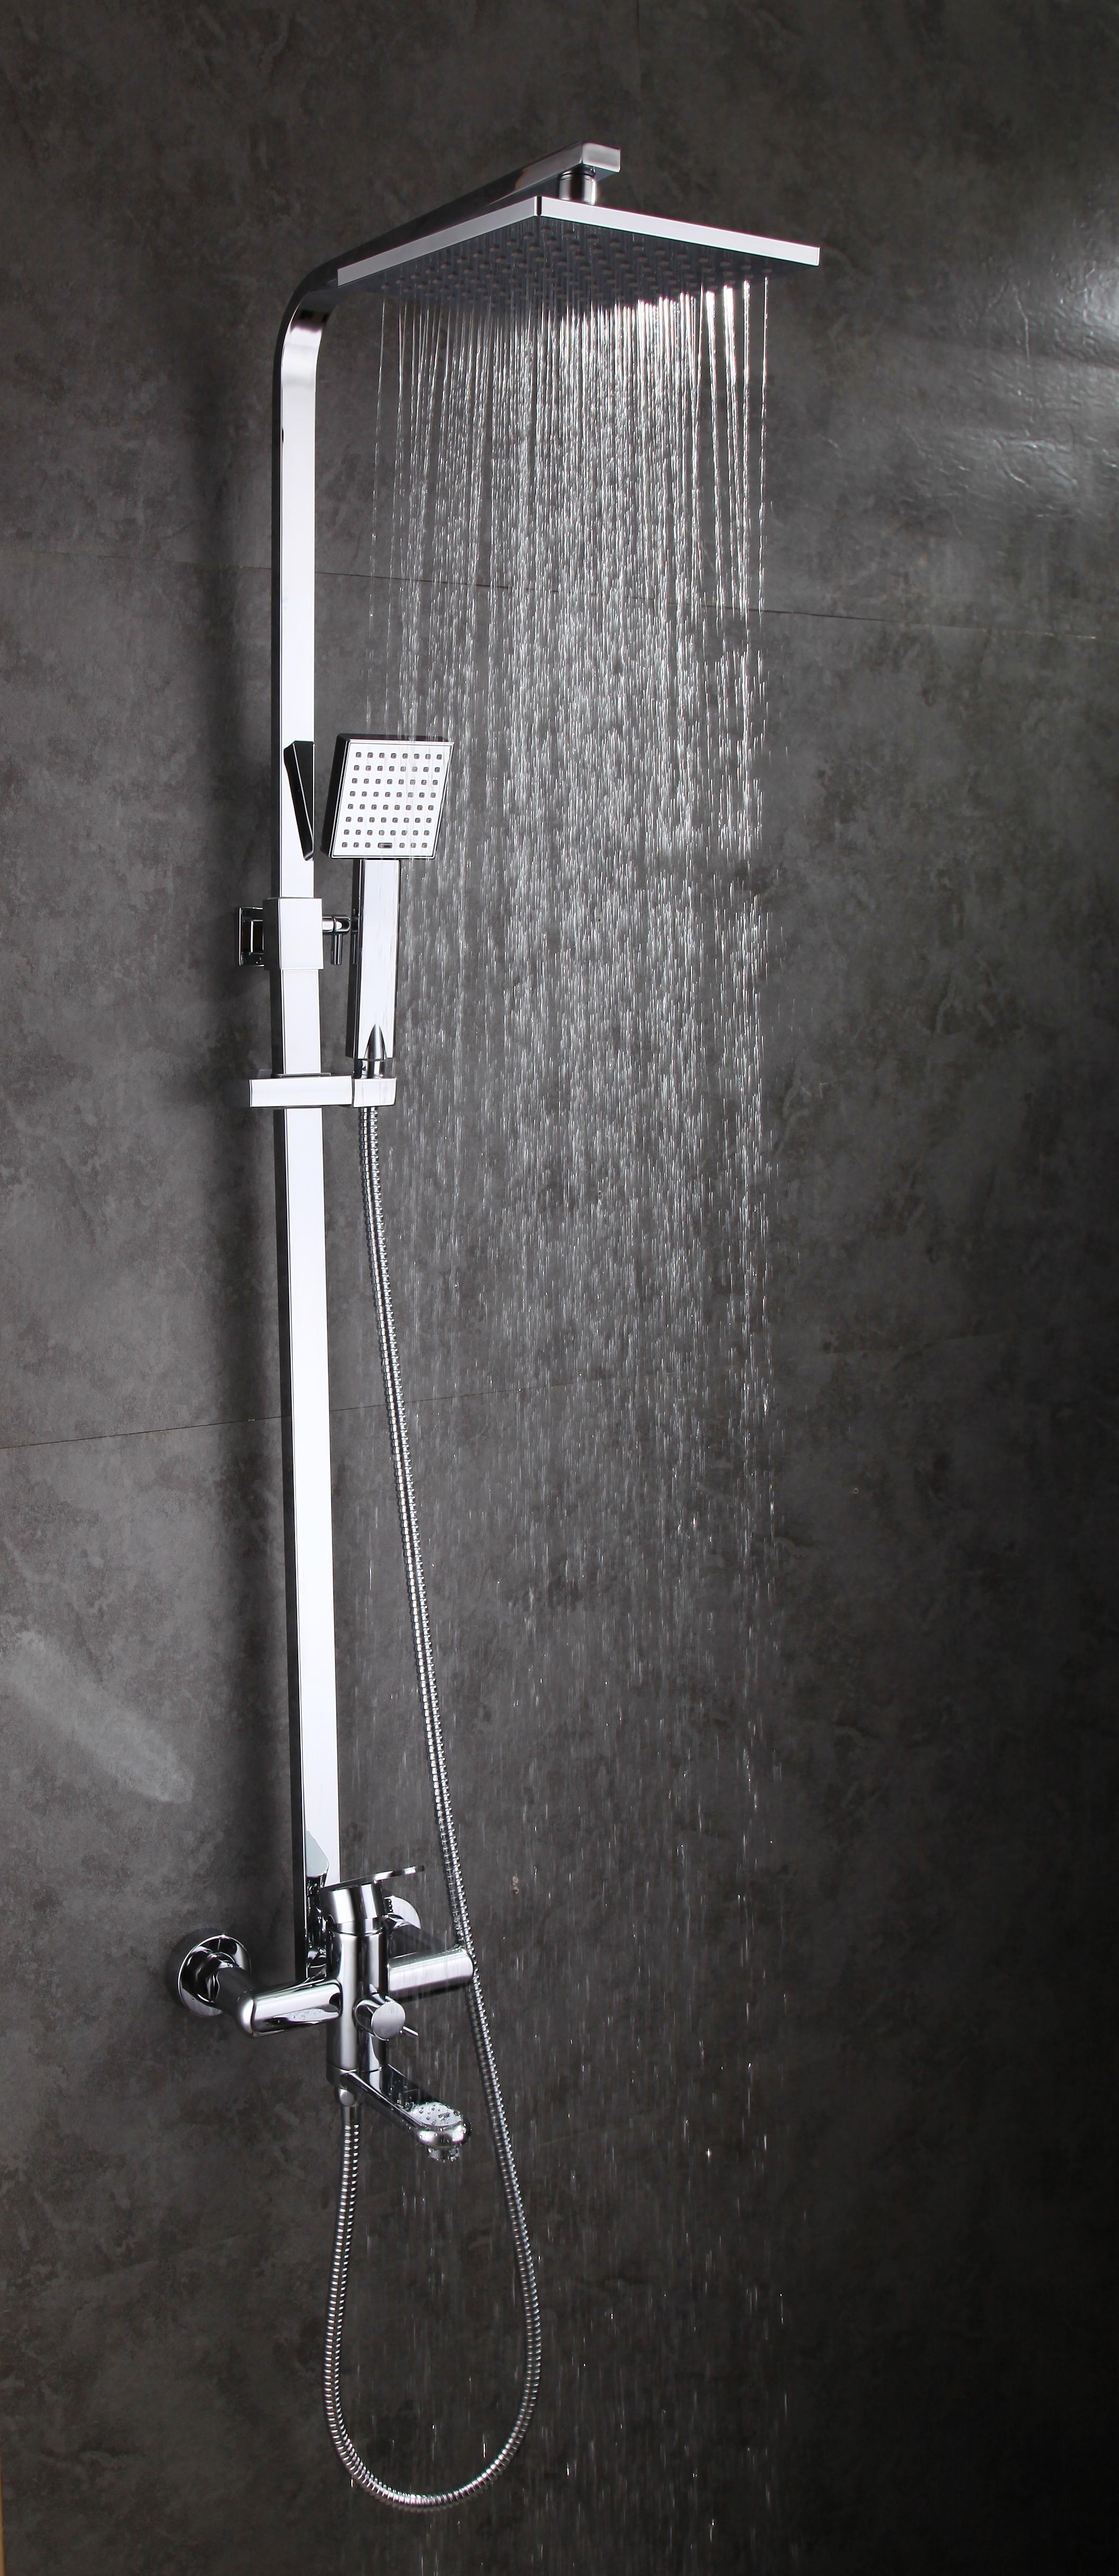 Modern Bathroom Wall Mount Rain Shower Set With Head